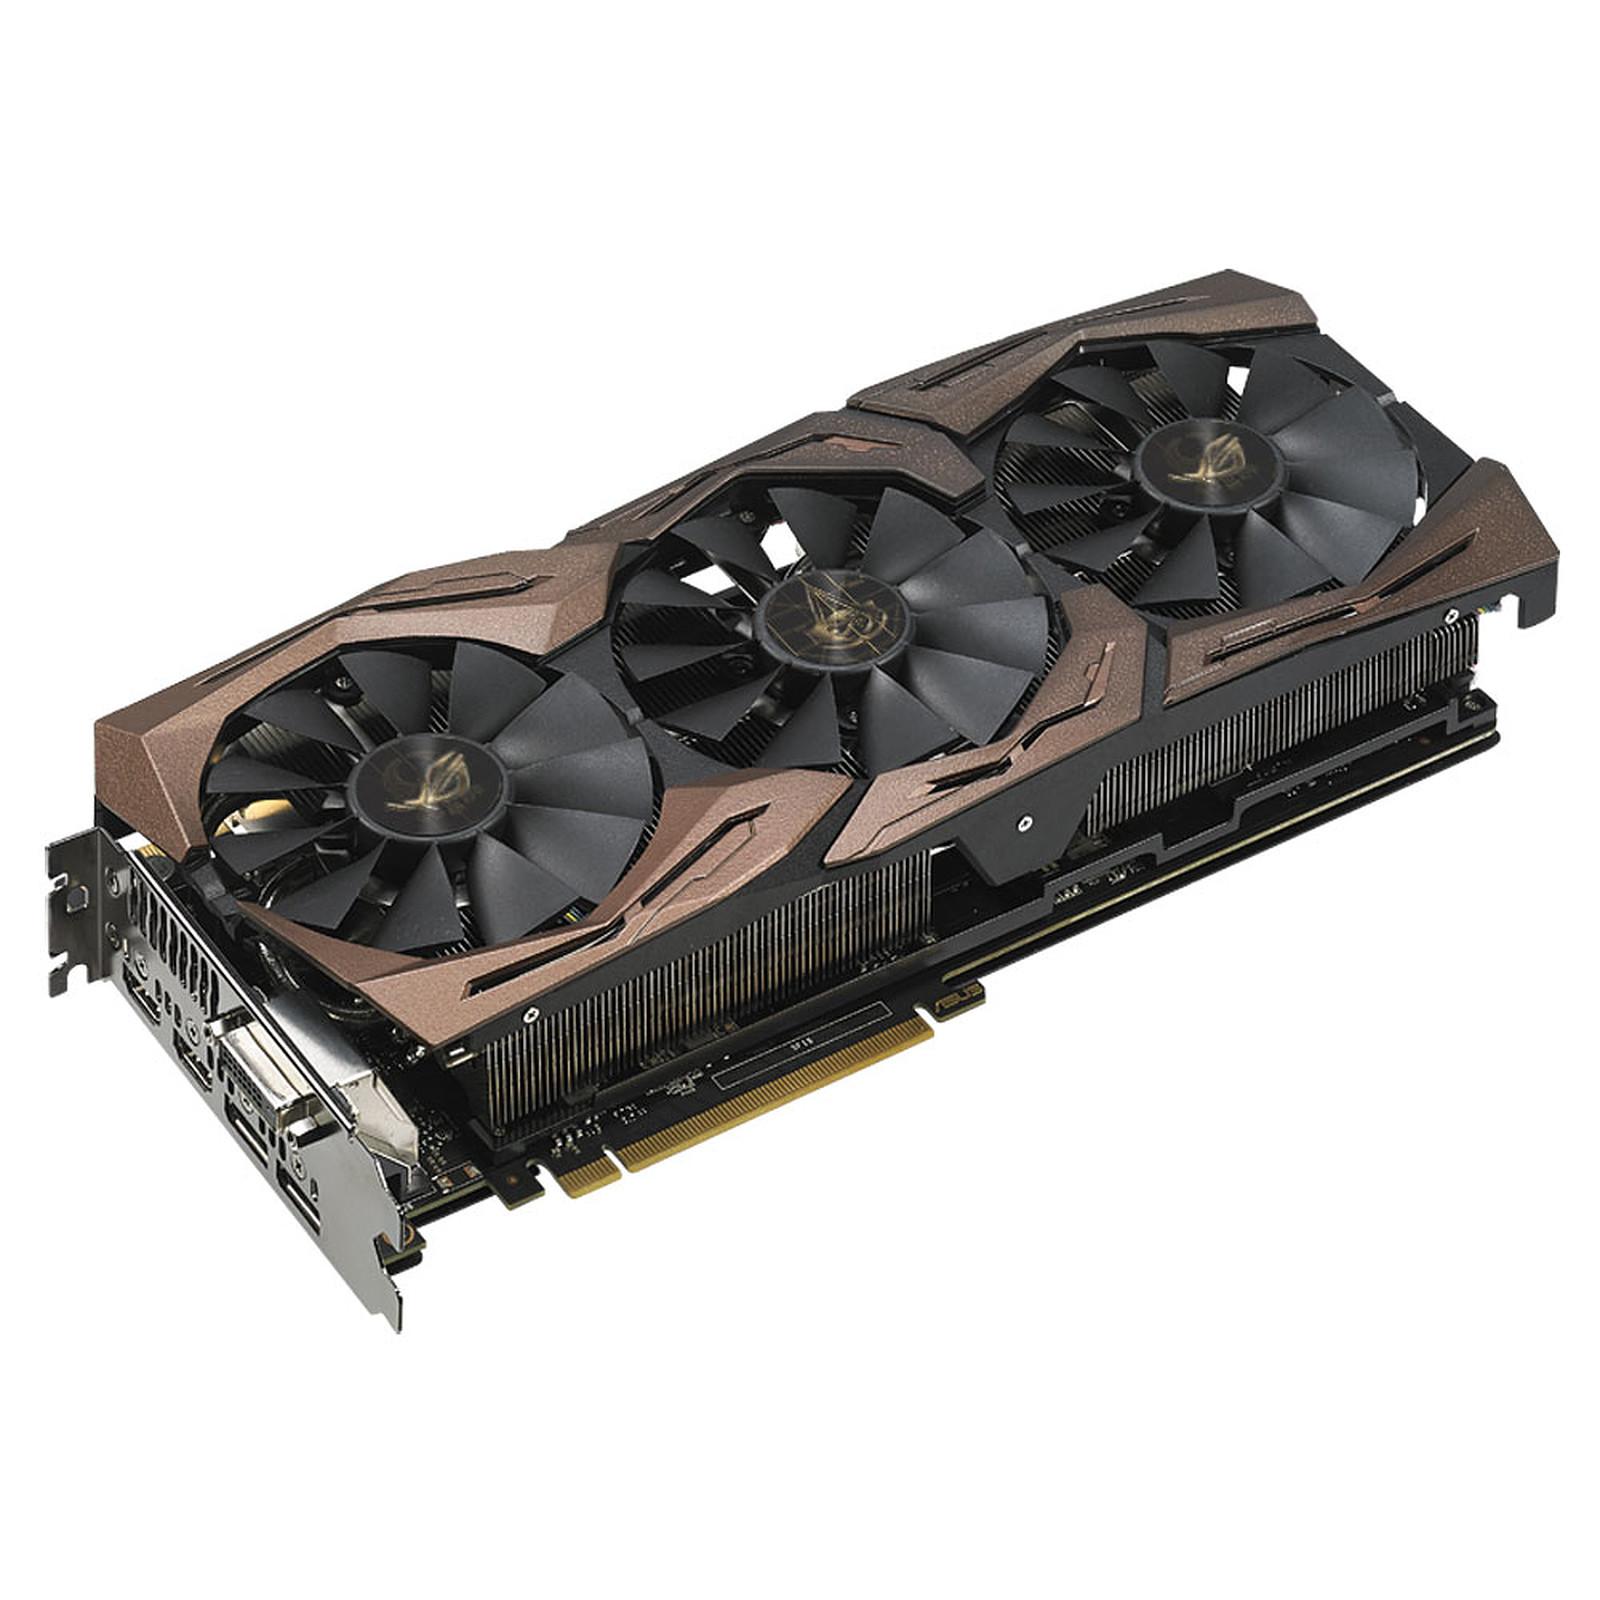 ASUS GeForce GTX 1080 Ti 11 GB ROG-STRIX-GTX1080TI - Assassin's Creed Origins Edition